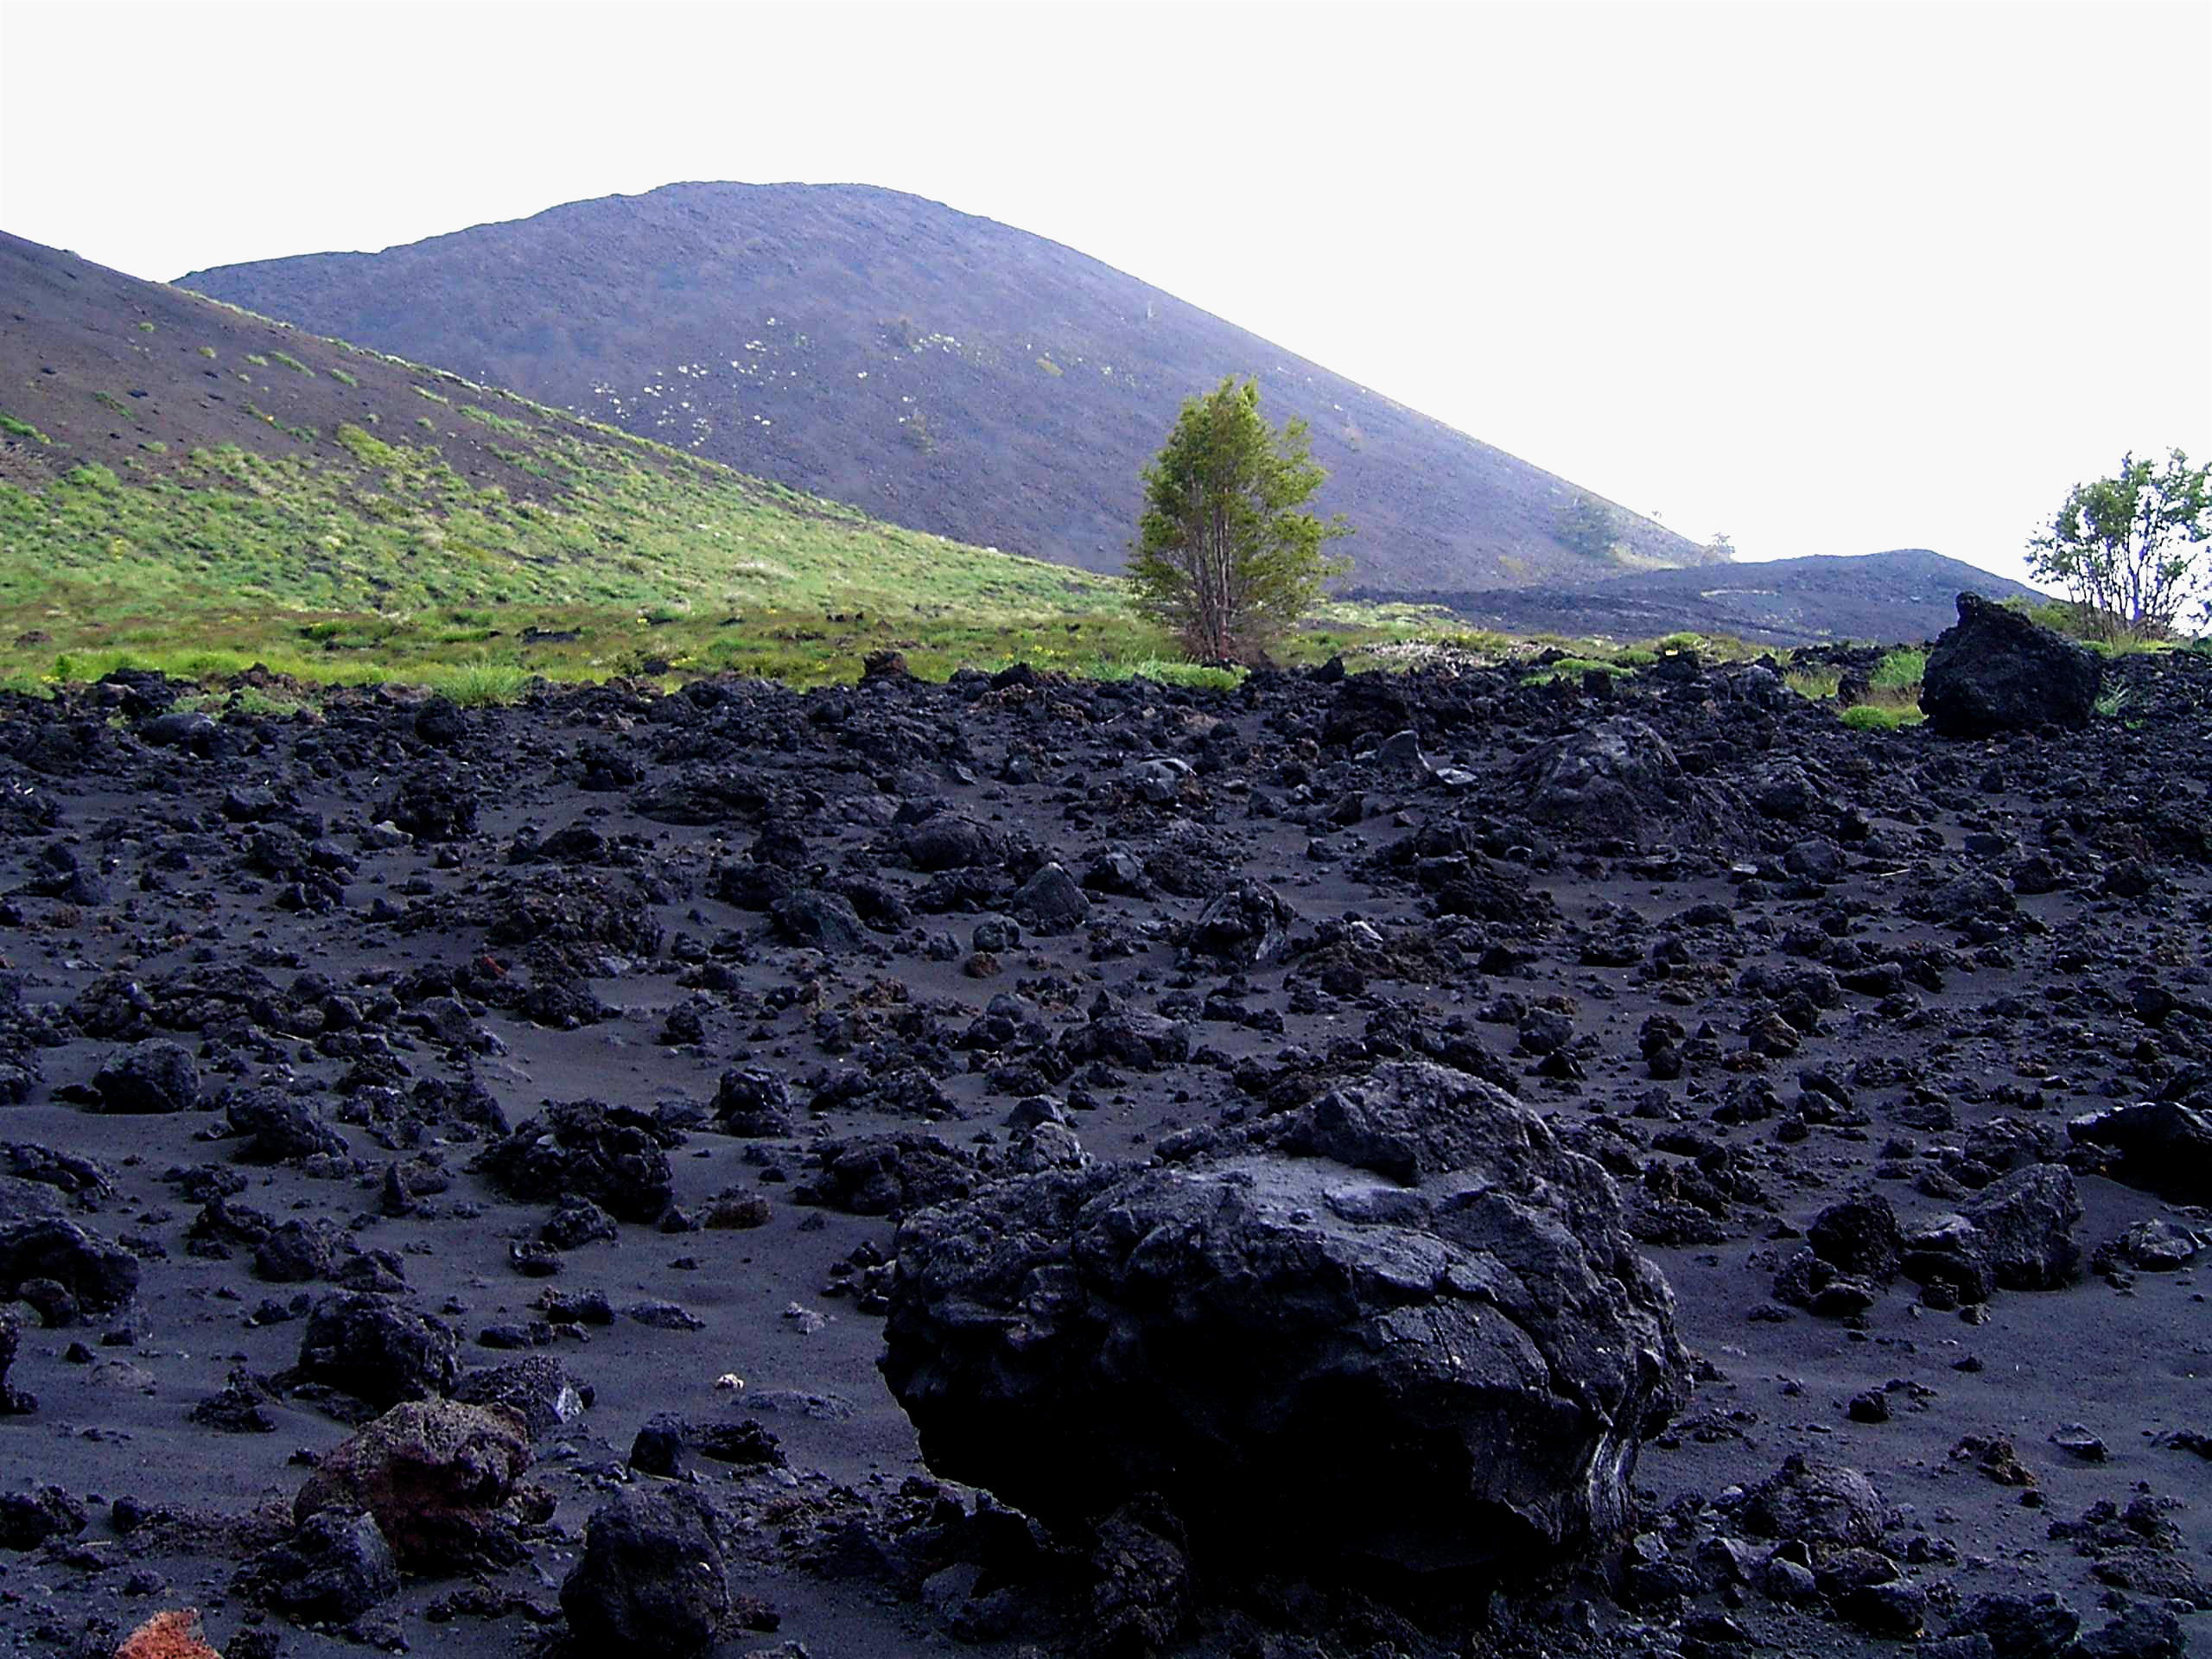 Versante orientale dell'Etna